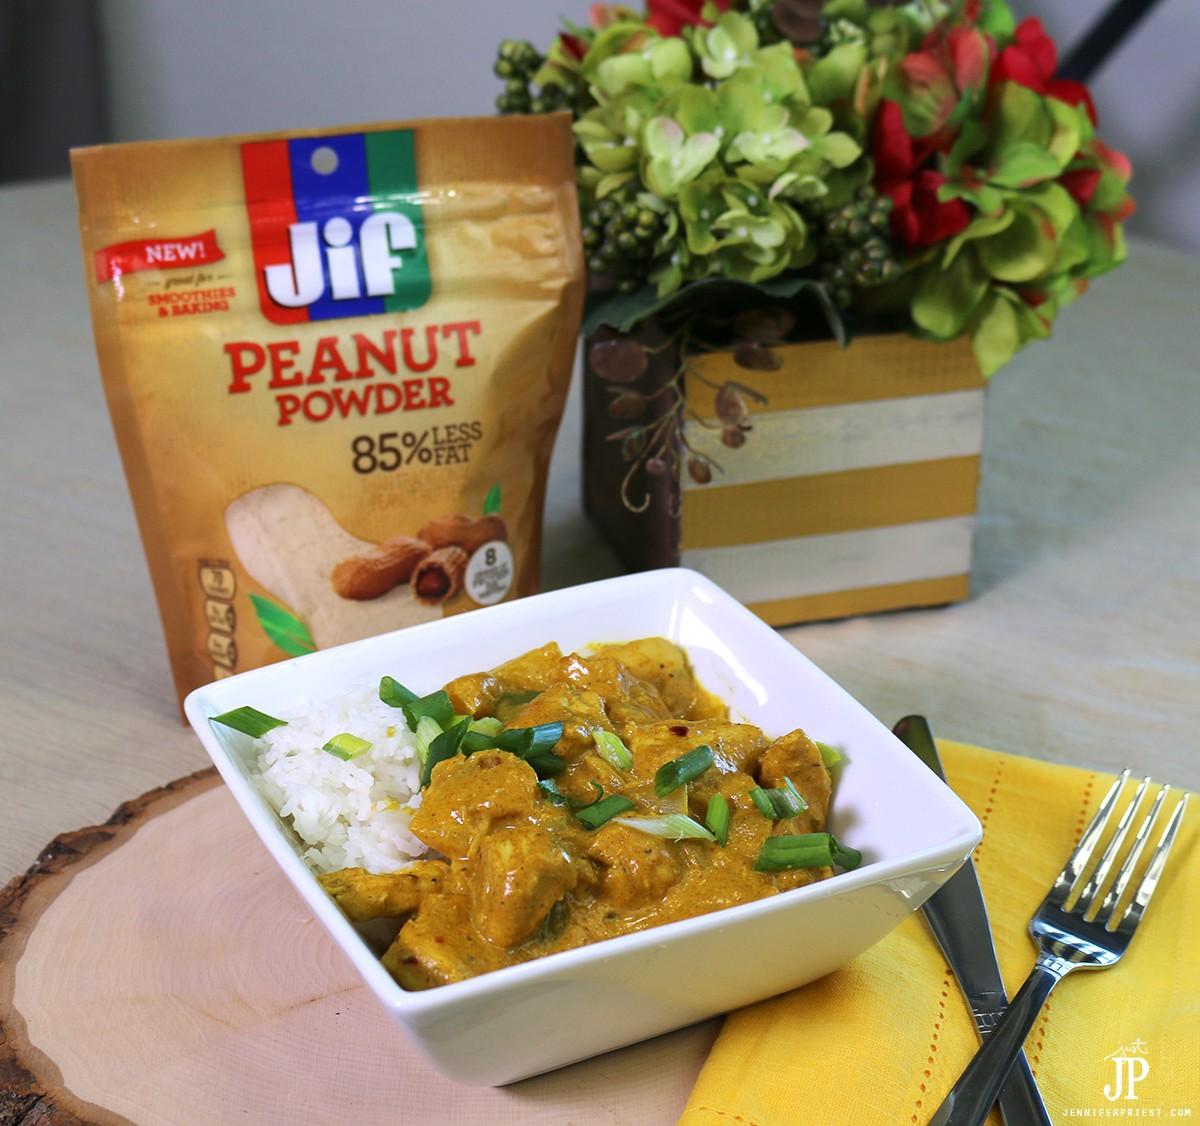 Thai-Peanut-Chicken-Curry-with-Jif-Peanut-Powder-JustJP